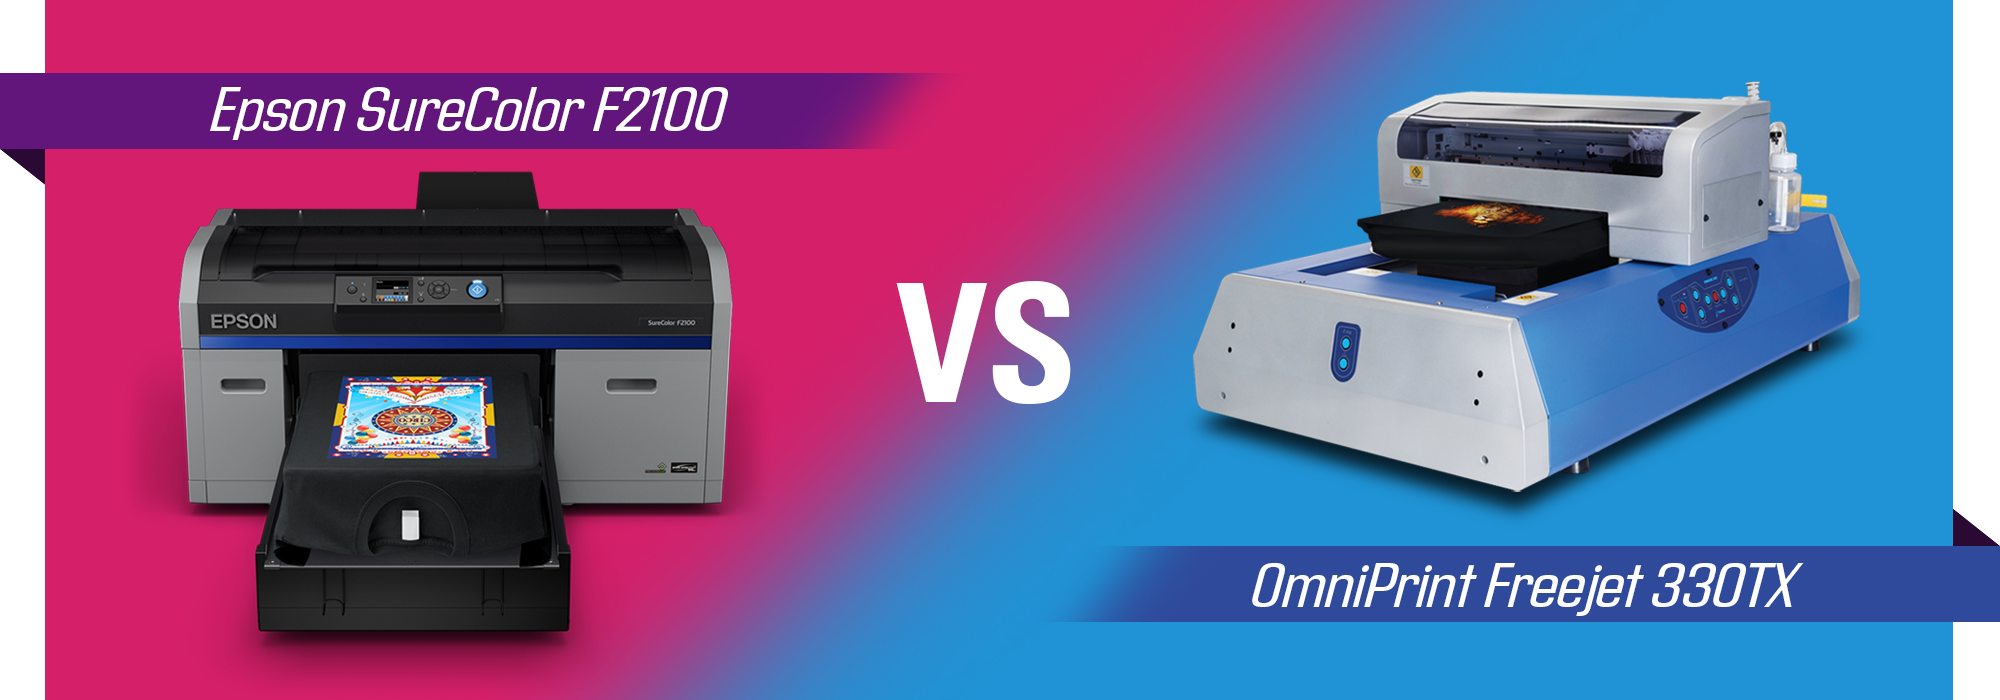 Epson SureColor F2100 vs OmniPrint Freejet 330TX